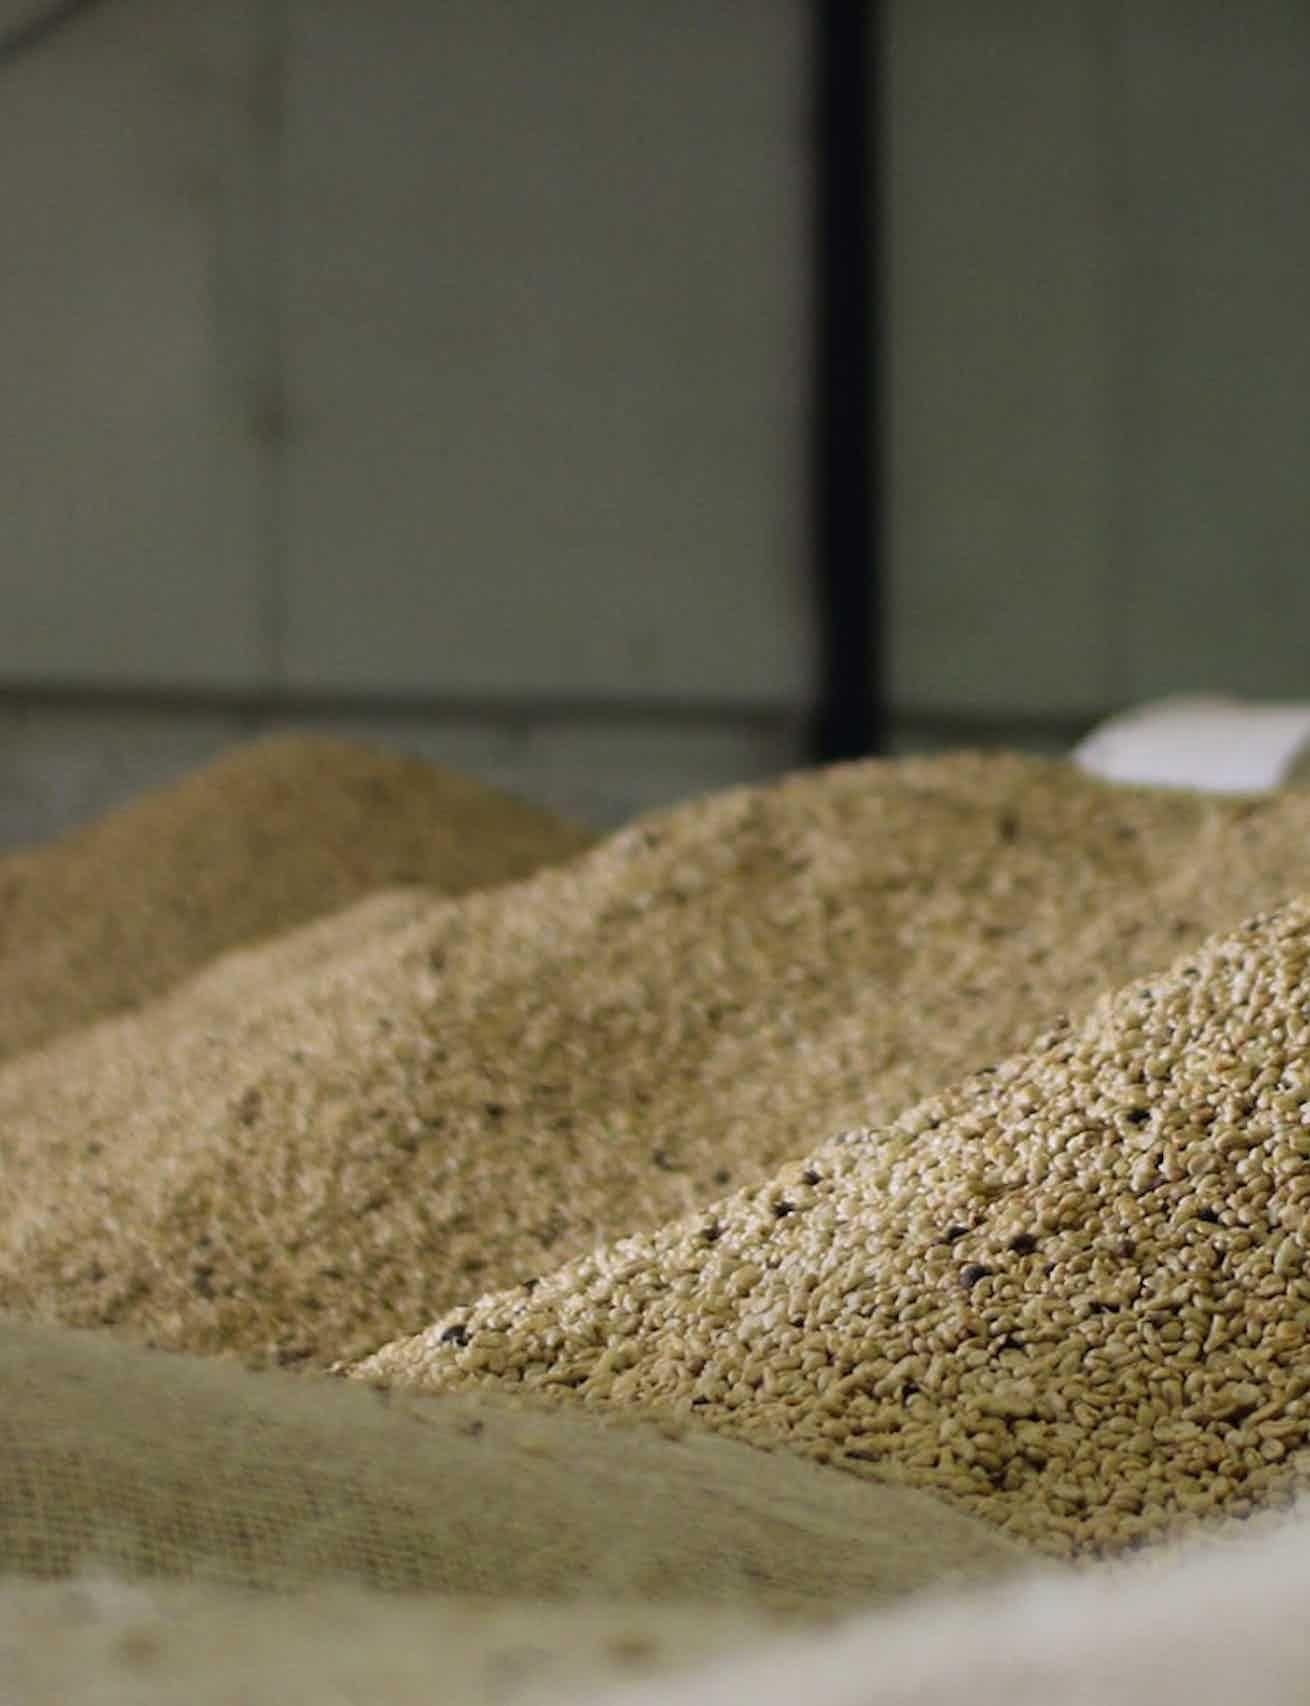 Processing Coffee at Origin